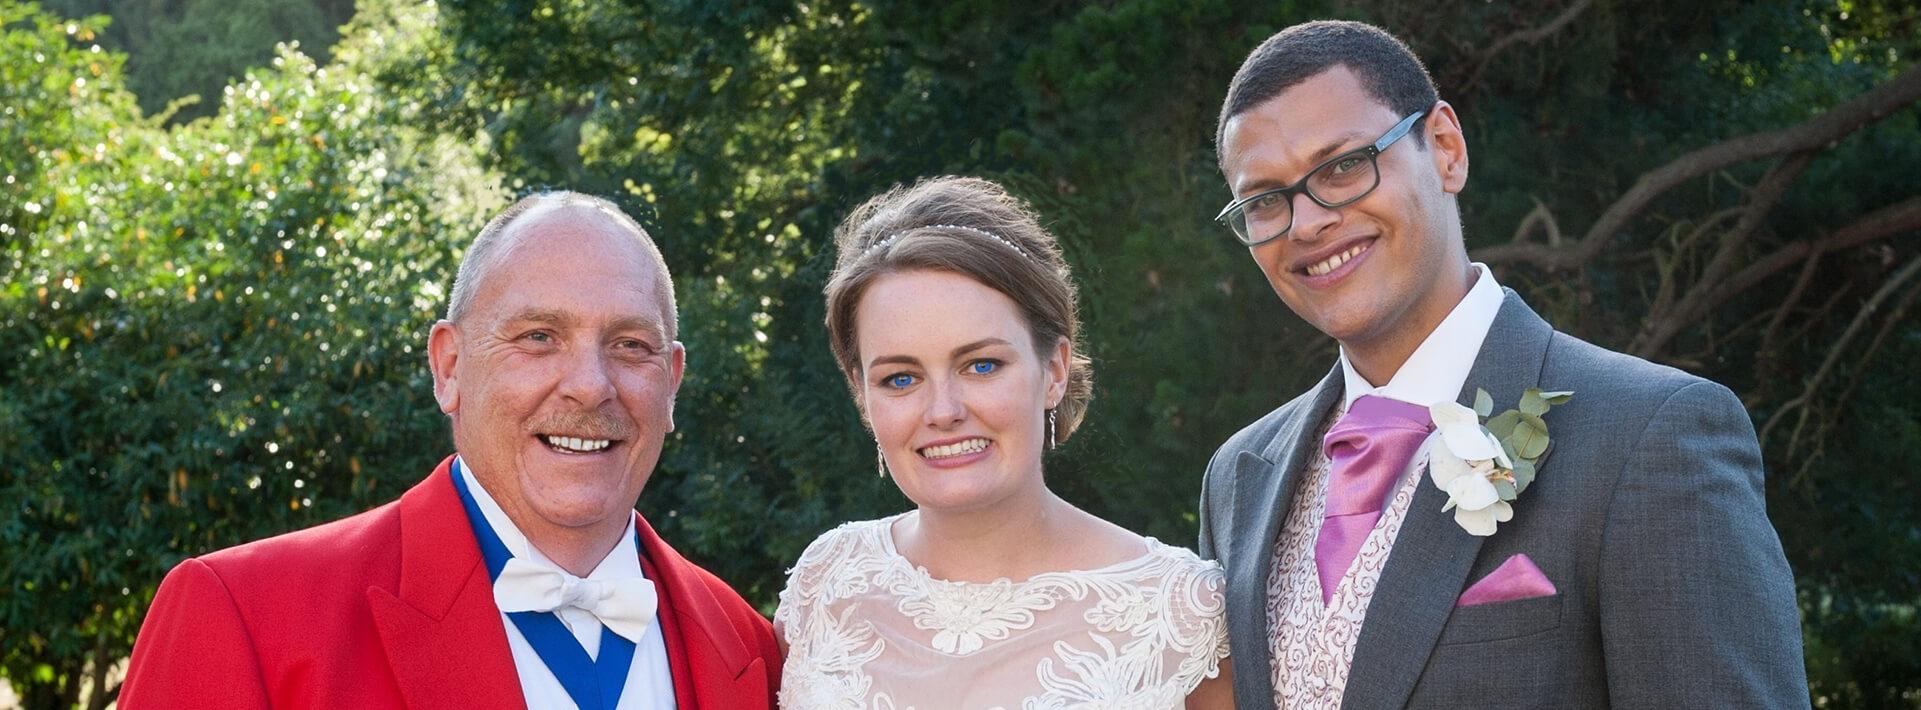 professional wedding toastmasters